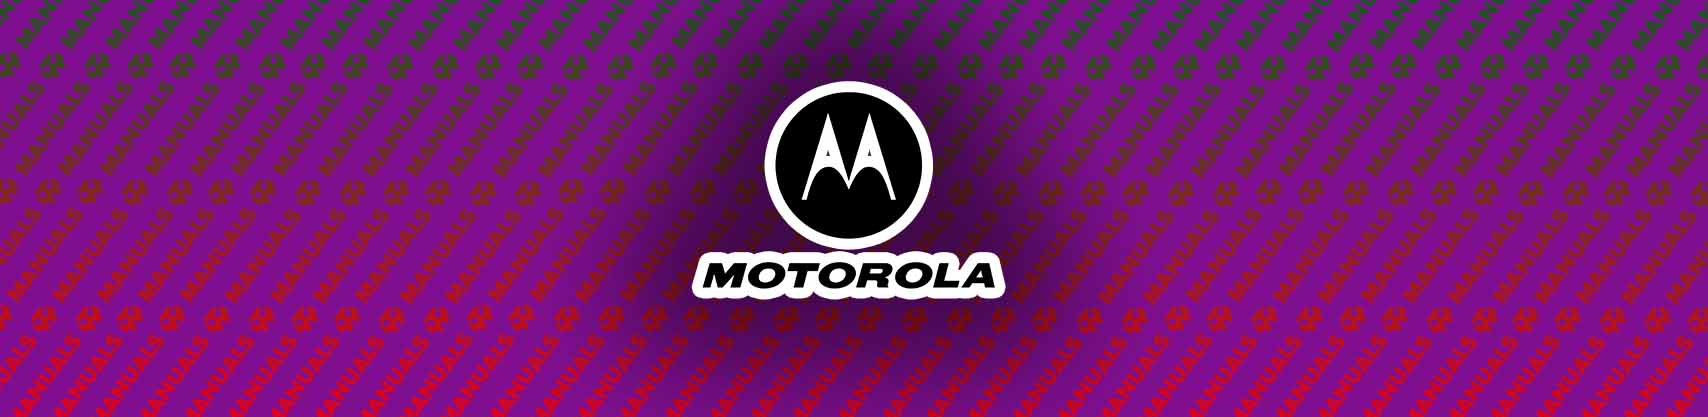 Motorola Minitor VI Manual